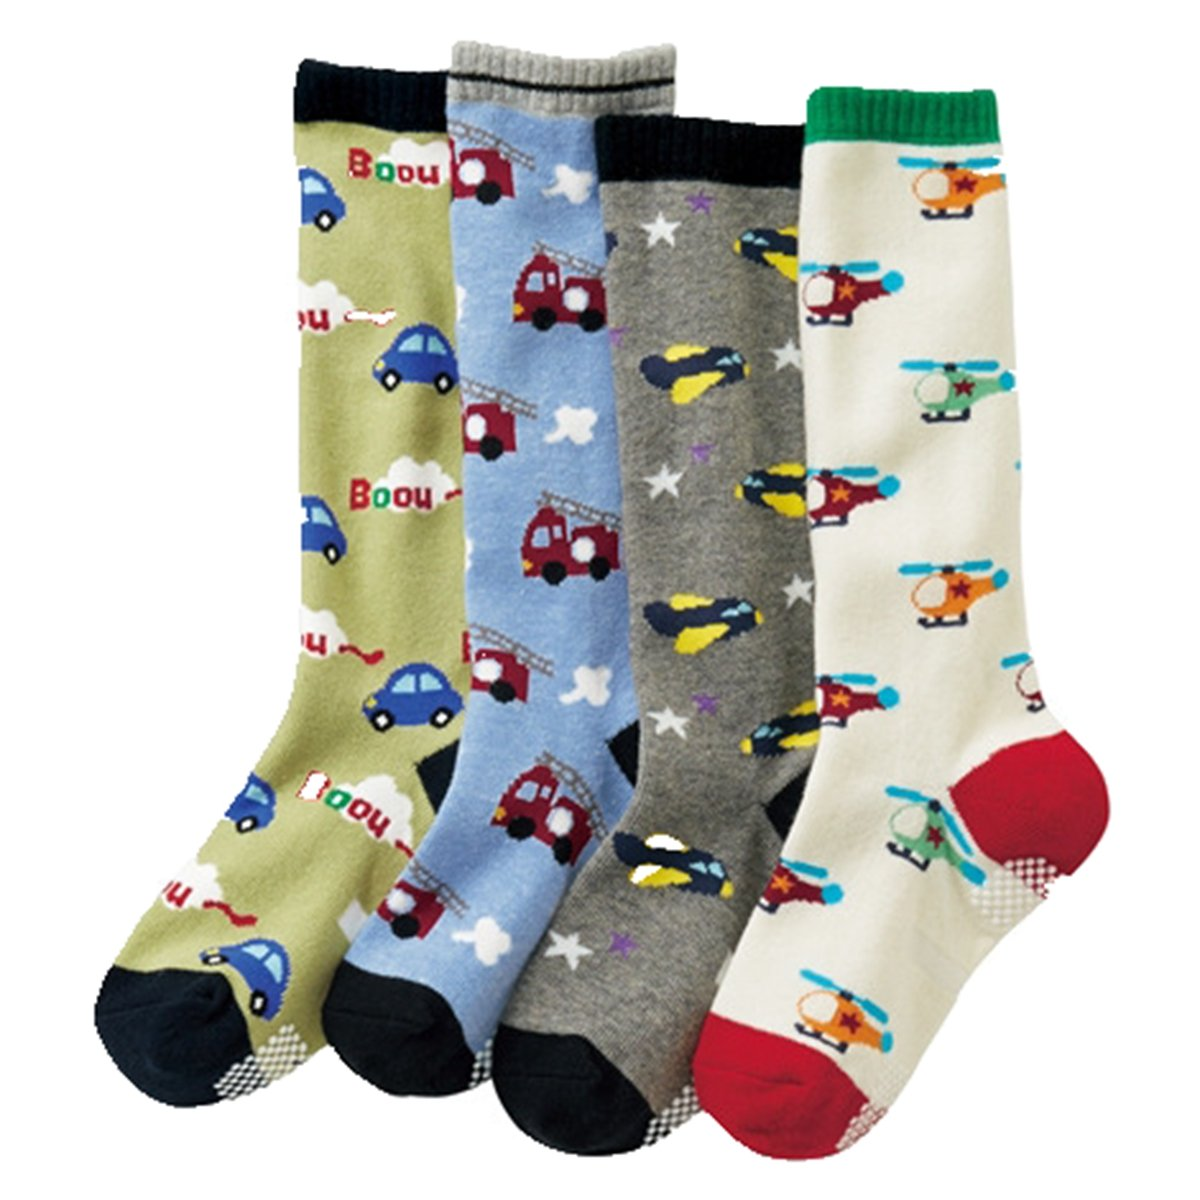 Baby Boys Non Skid Chopper Cotton Toddler Socks Soft Knee High Socks 4-Pairs